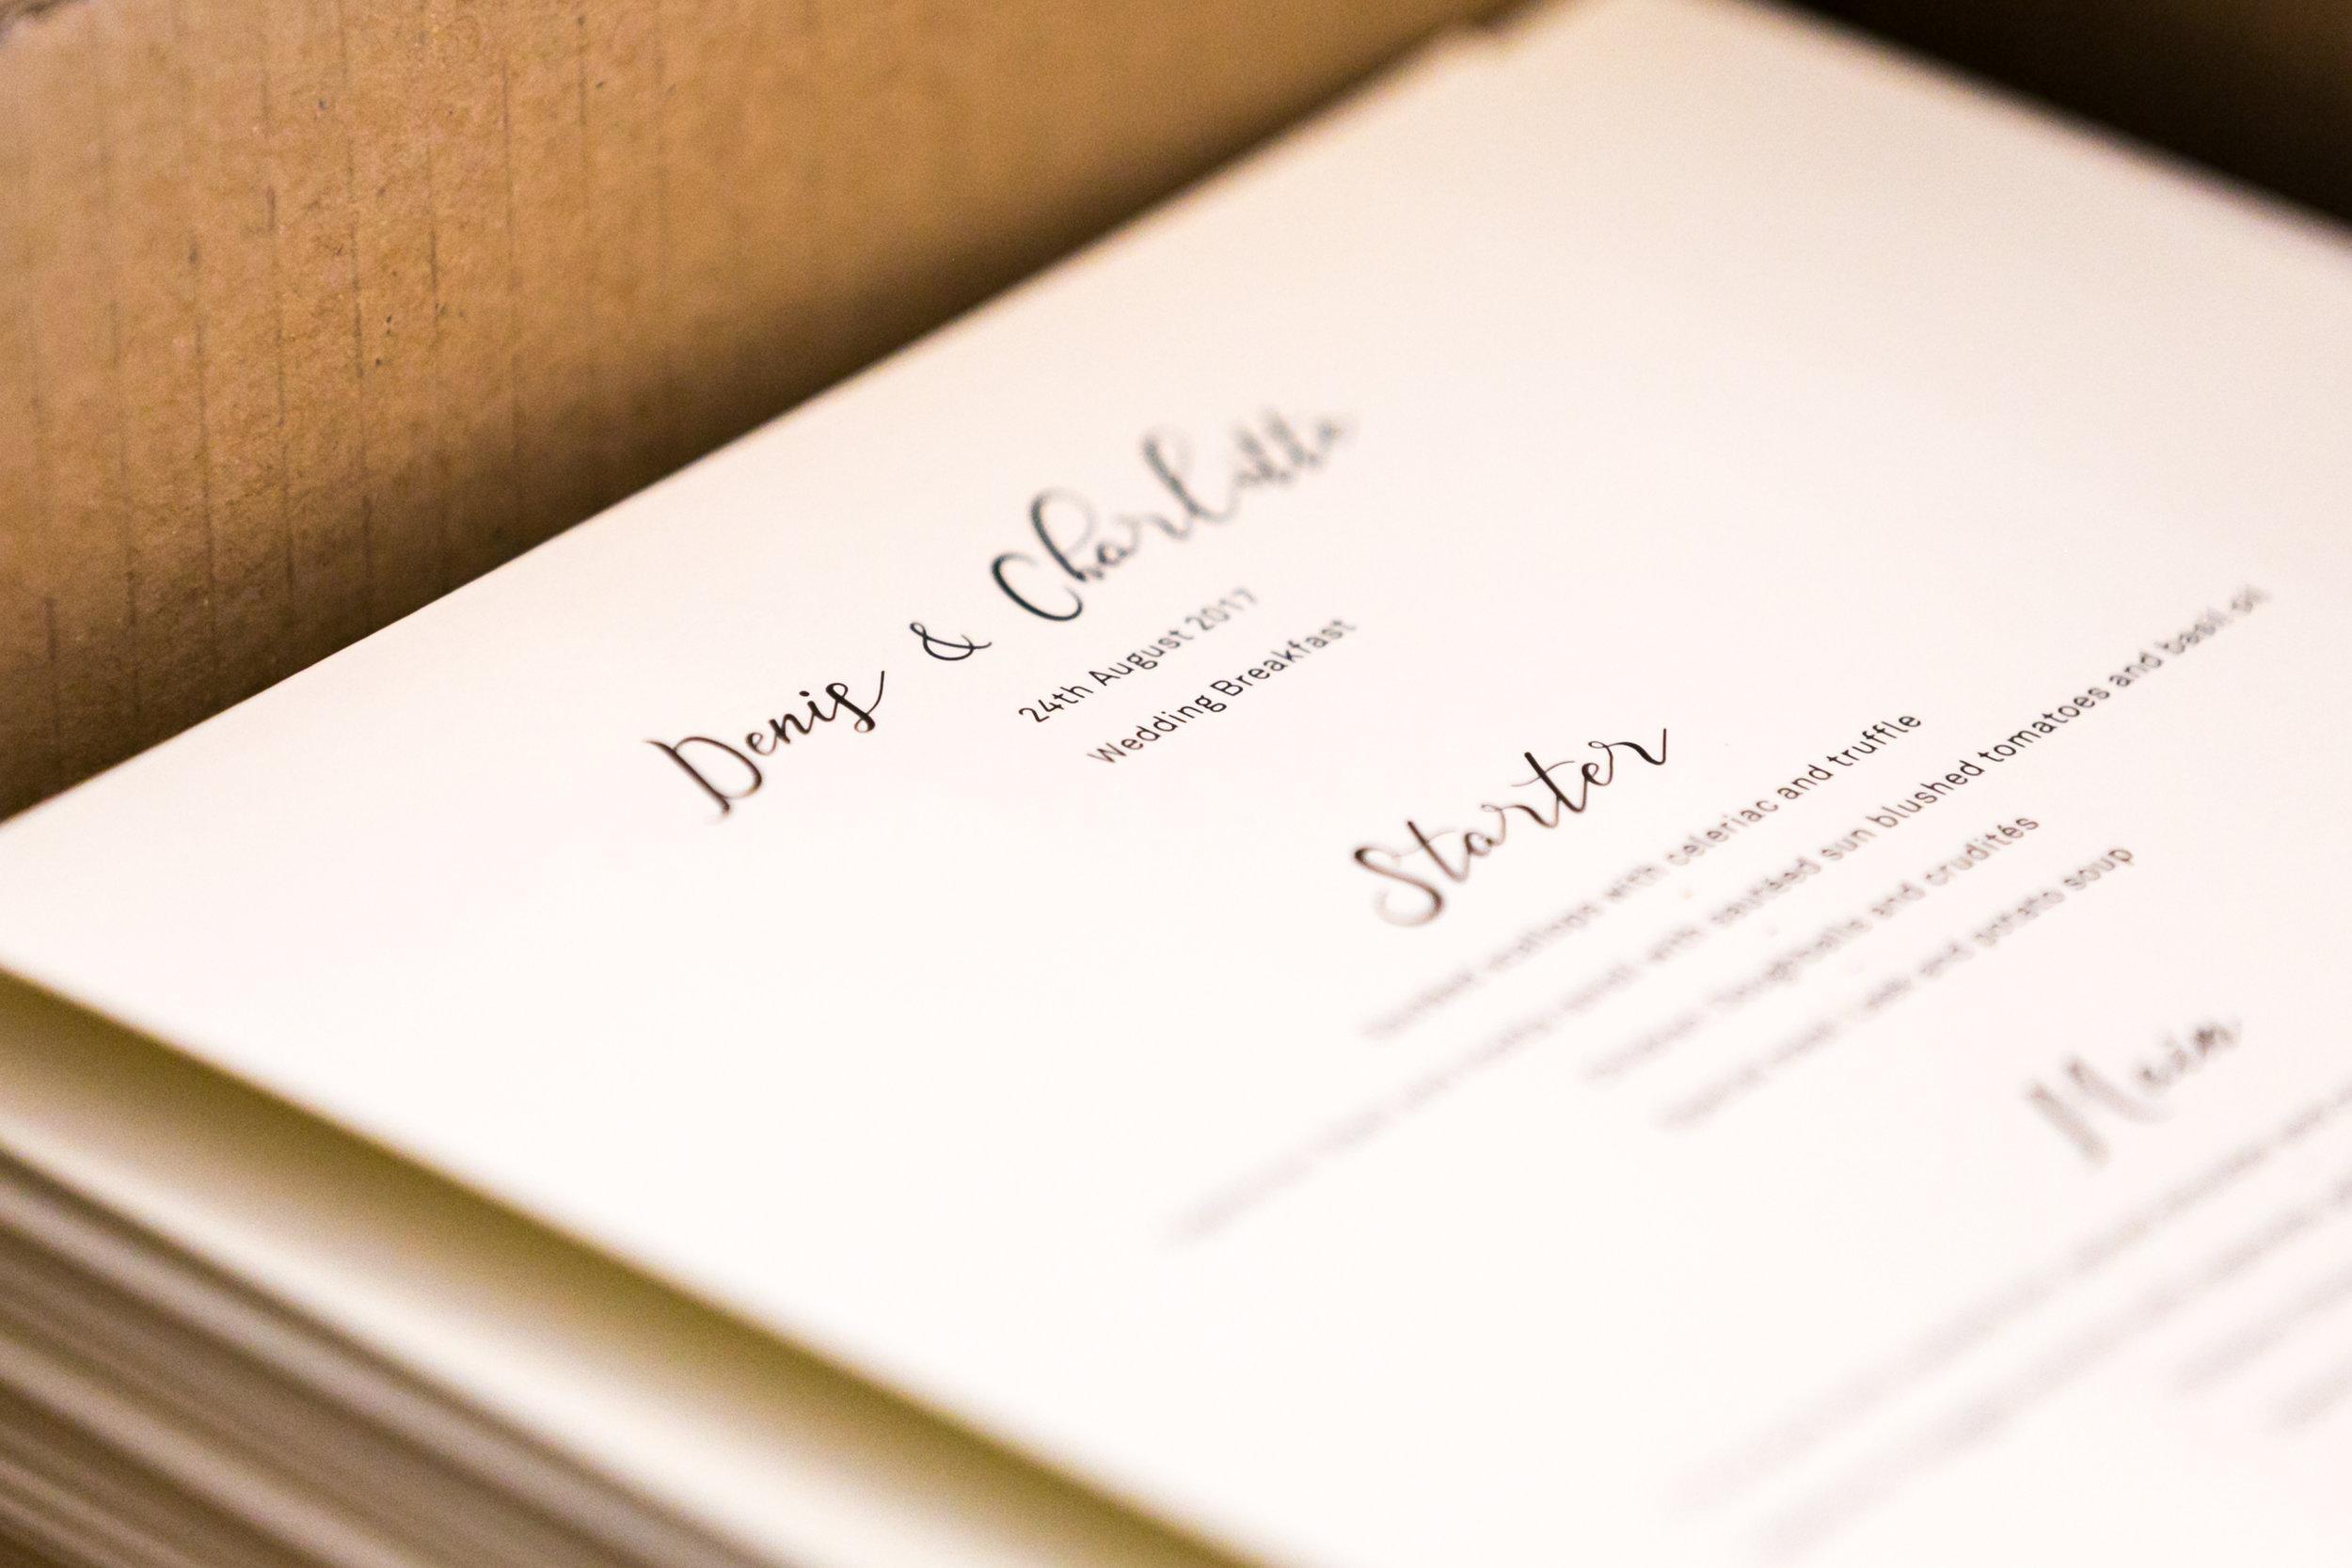 Charlotte-Denis-Wedding-Stationary-7.jpg